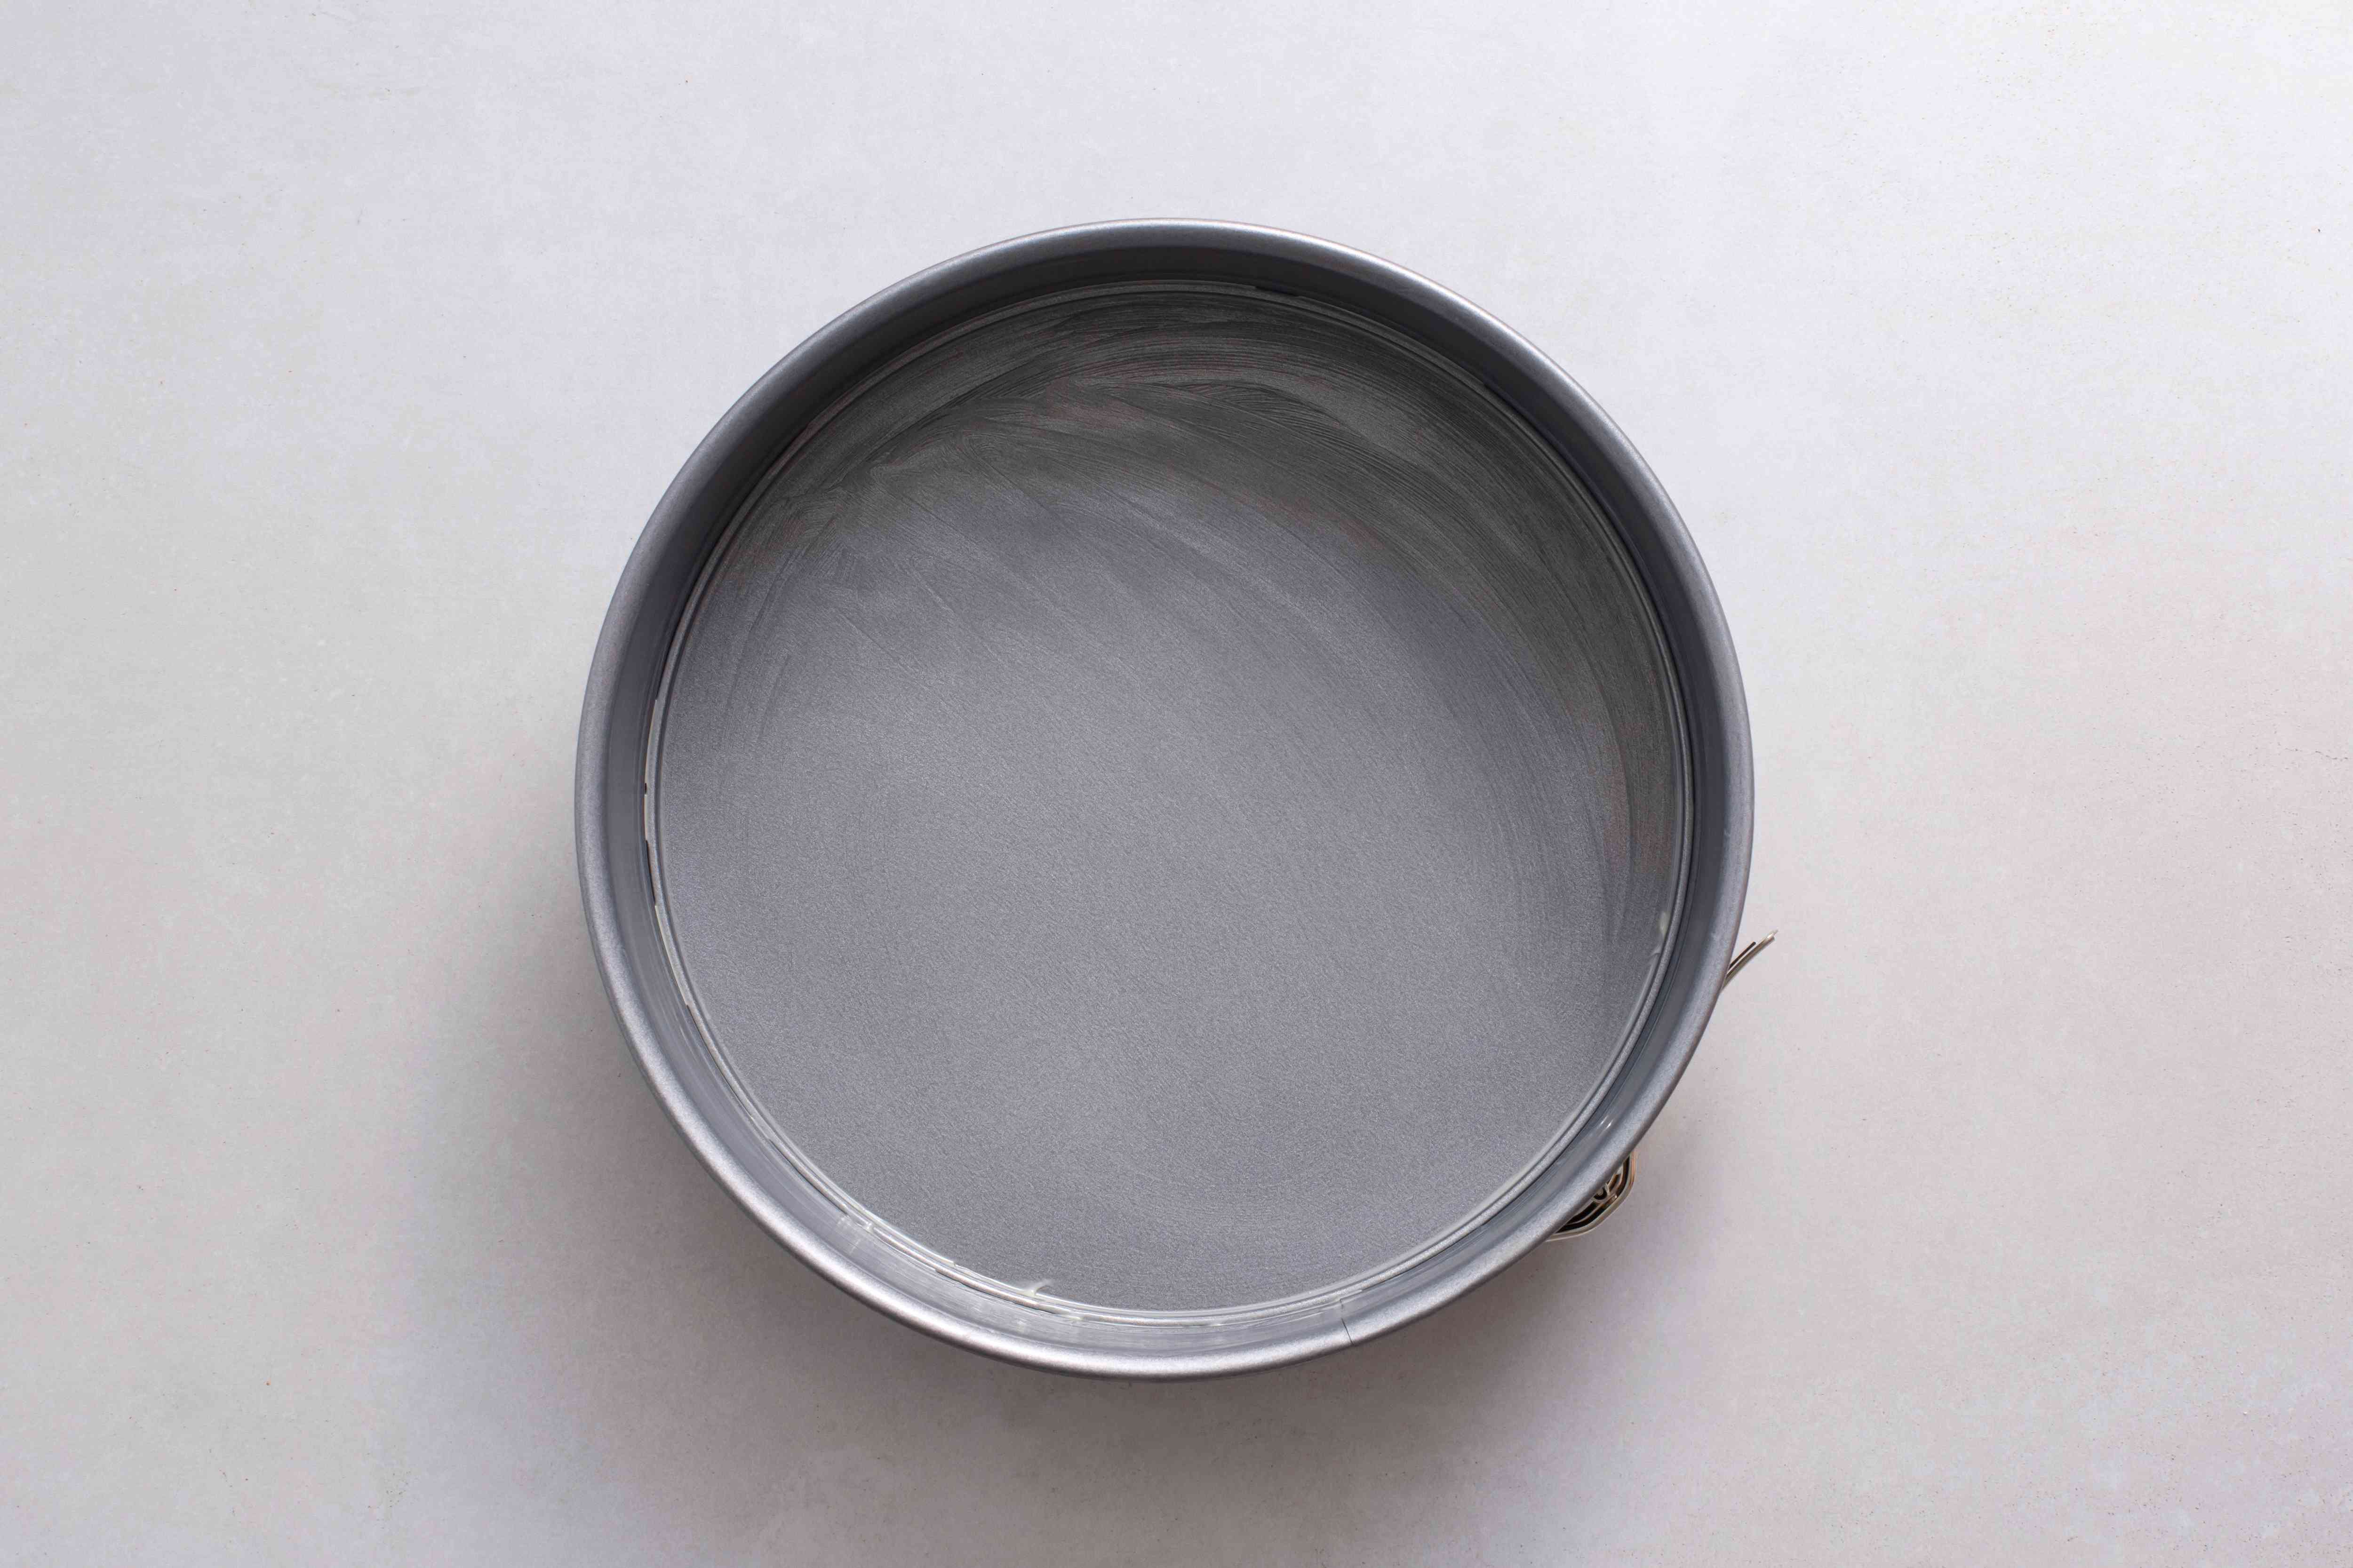 greased springform pan